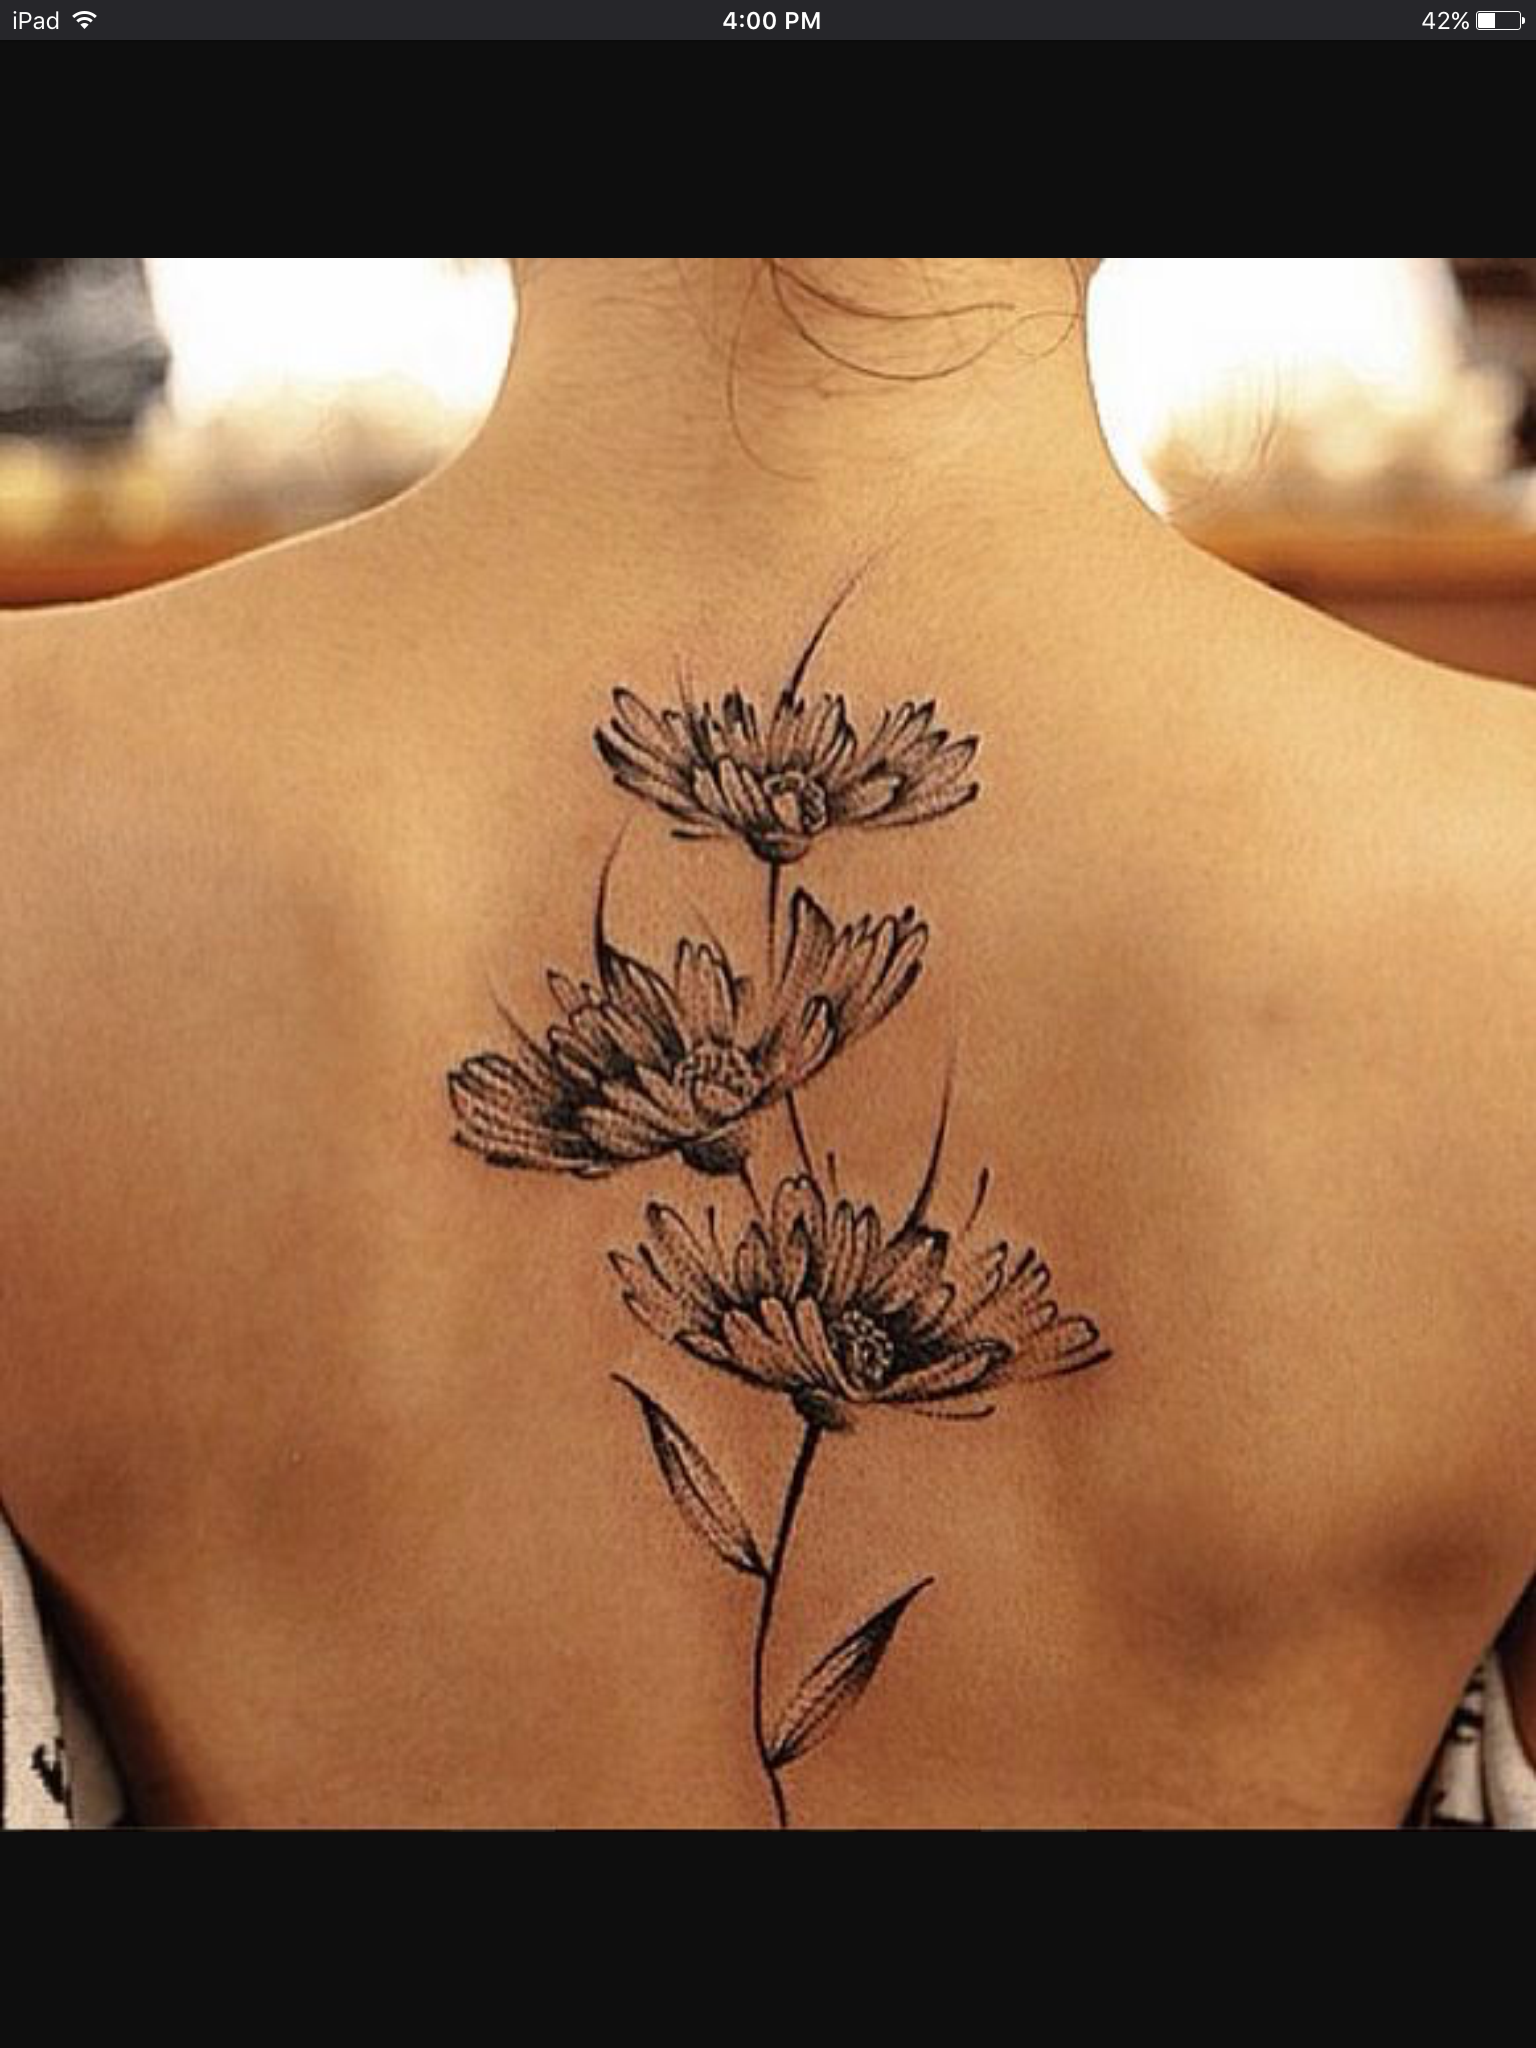 Pin by Kristin Zerfass on Tattoos Spine tattoos, Daisy